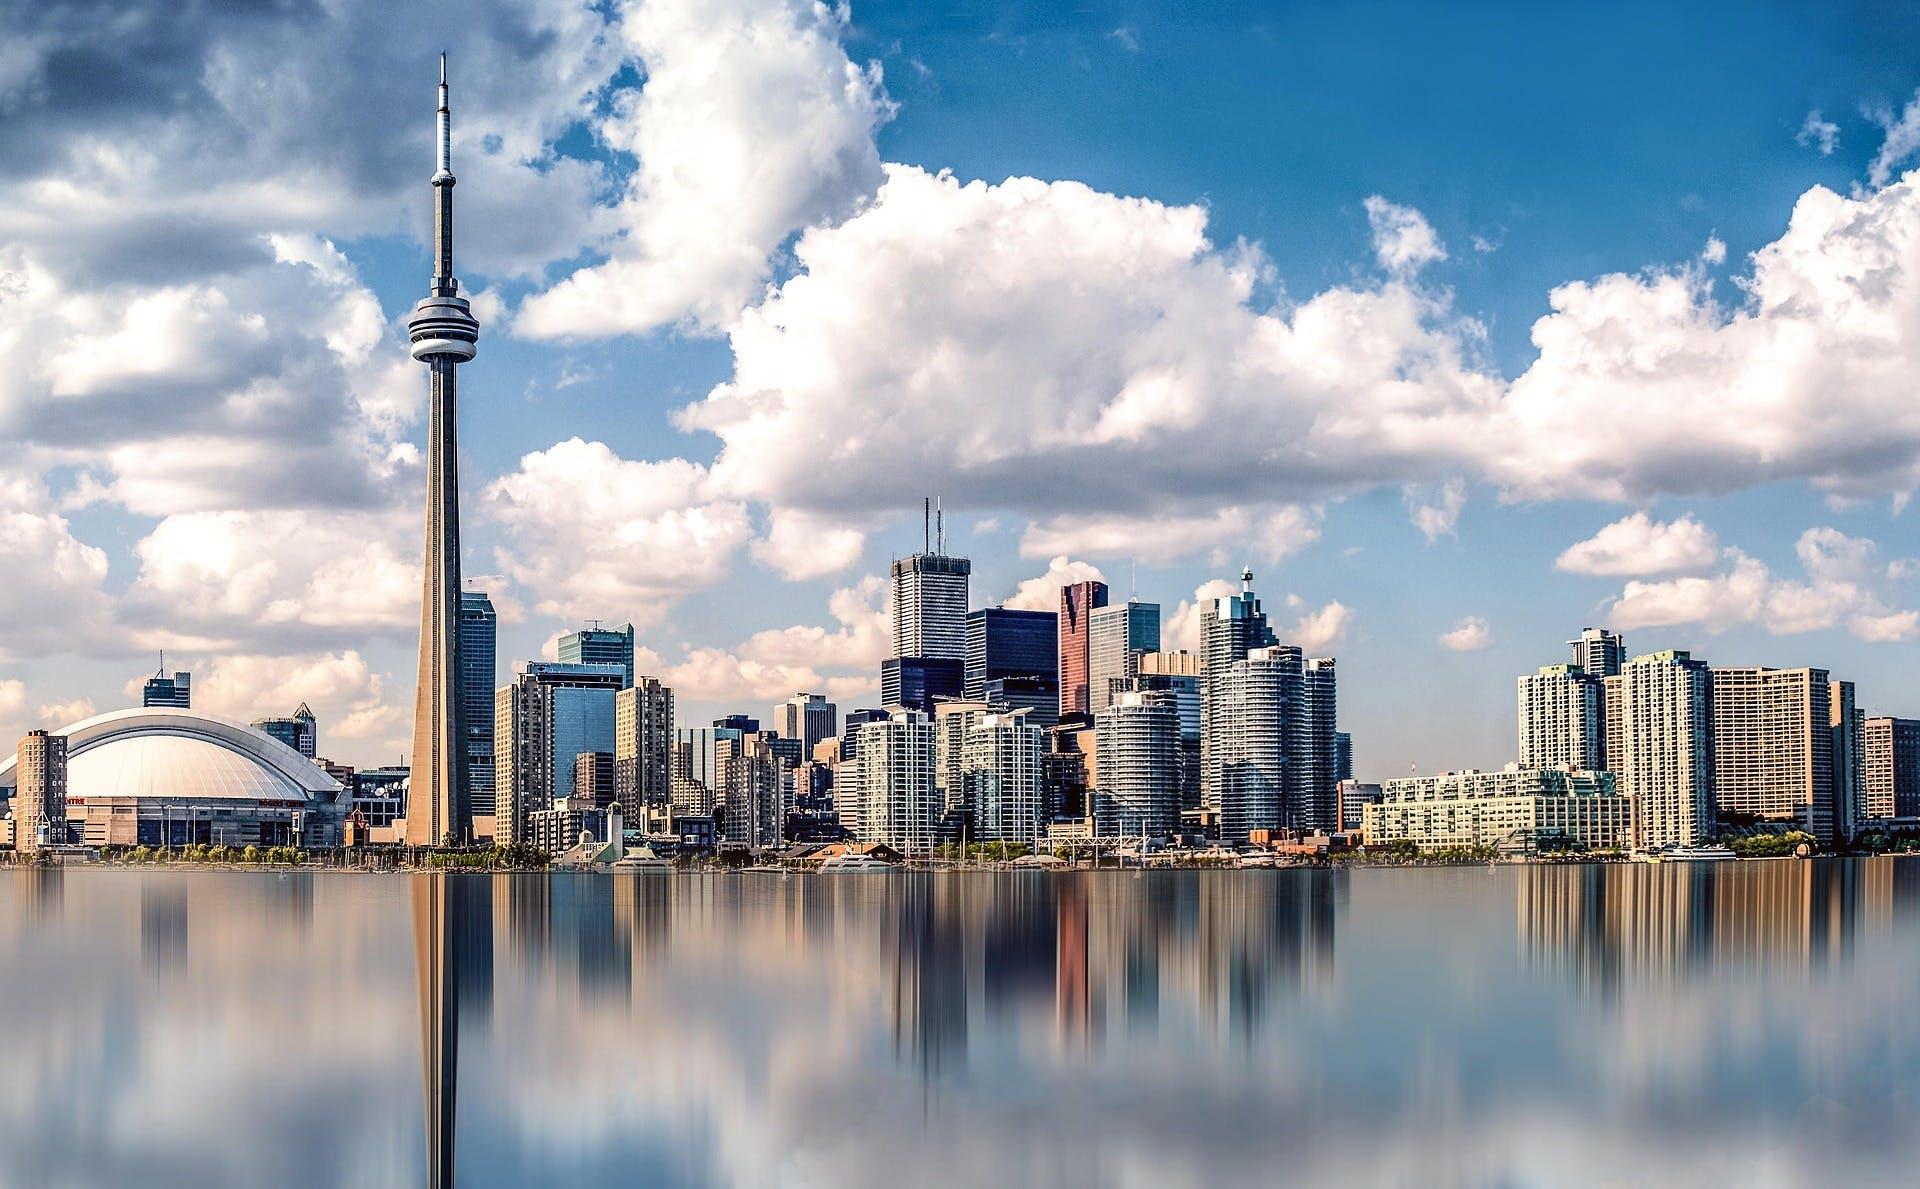 Toronto skyline from Lake Ontario, photo by Pixabay